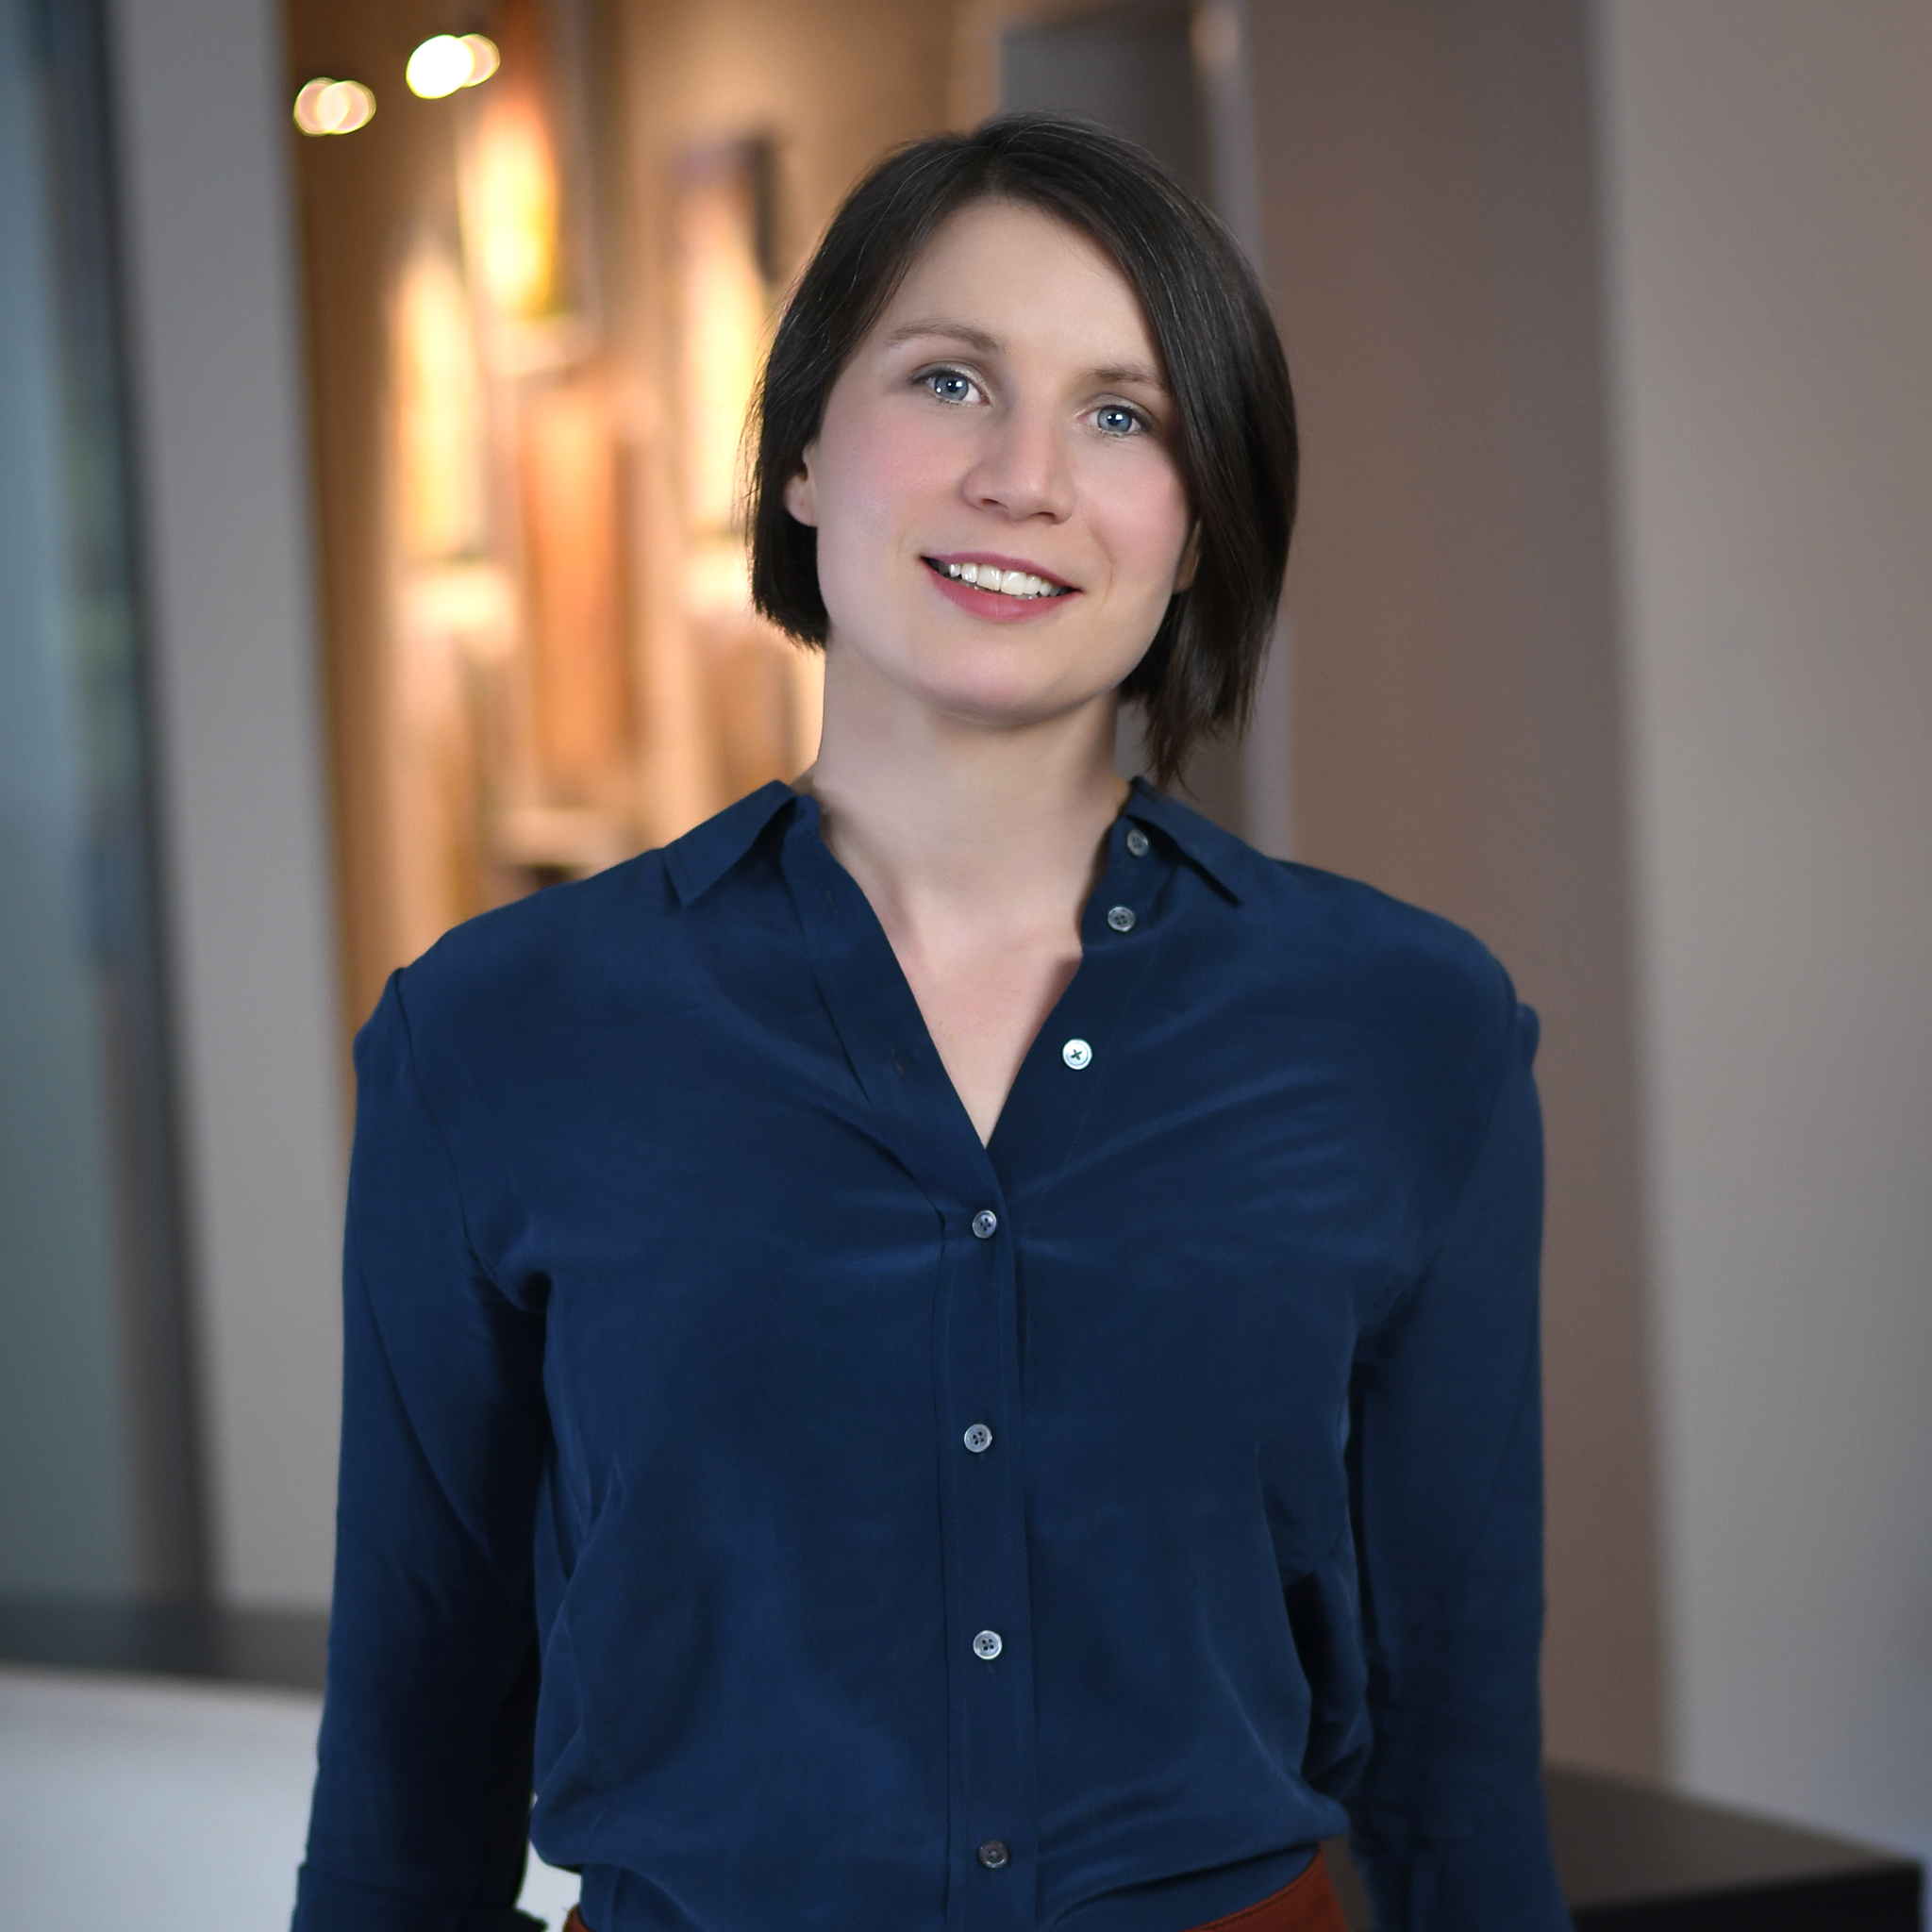 Kelly Marburger 2022